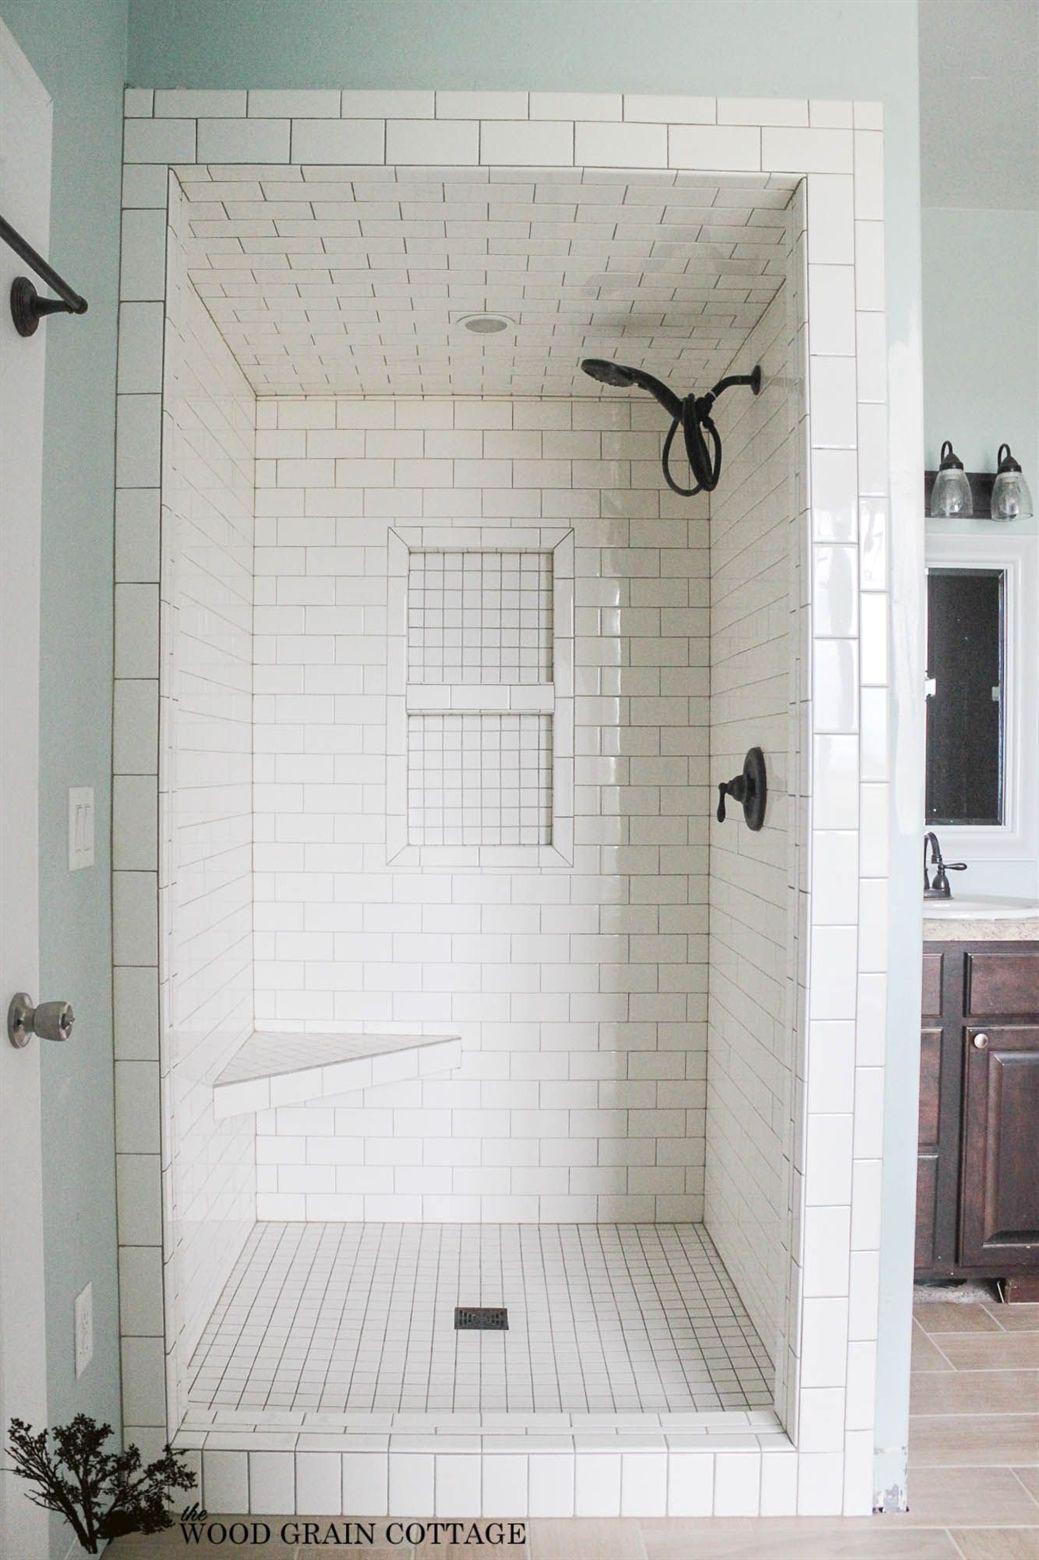 New Master Bathroom Tile The Wood Grain Cottage Small Bathroom With Shower Master Bathroom Renovation Shower Remodel